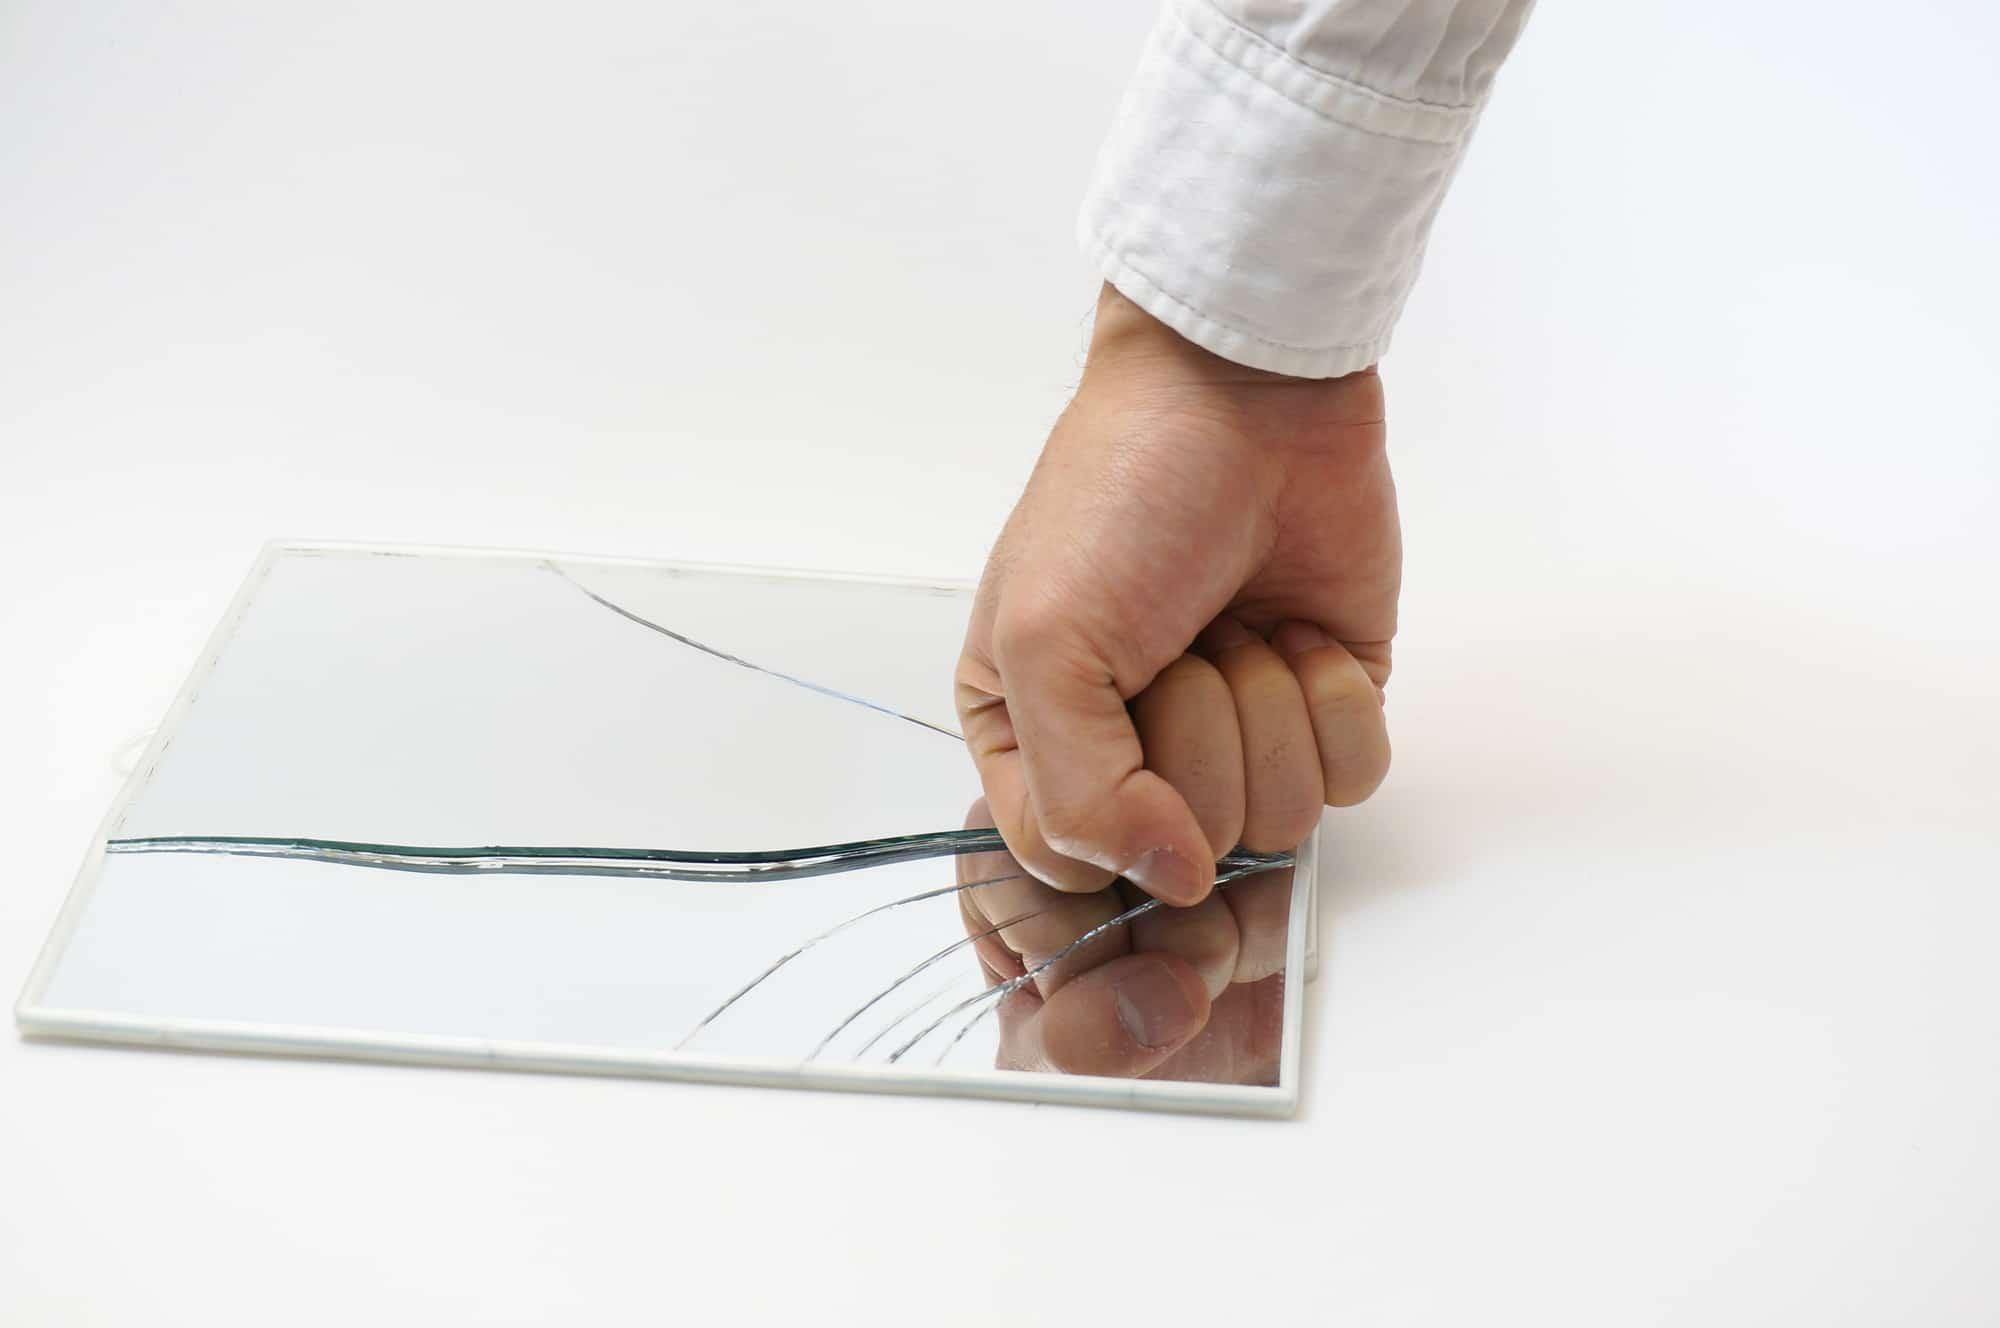 glass splinter